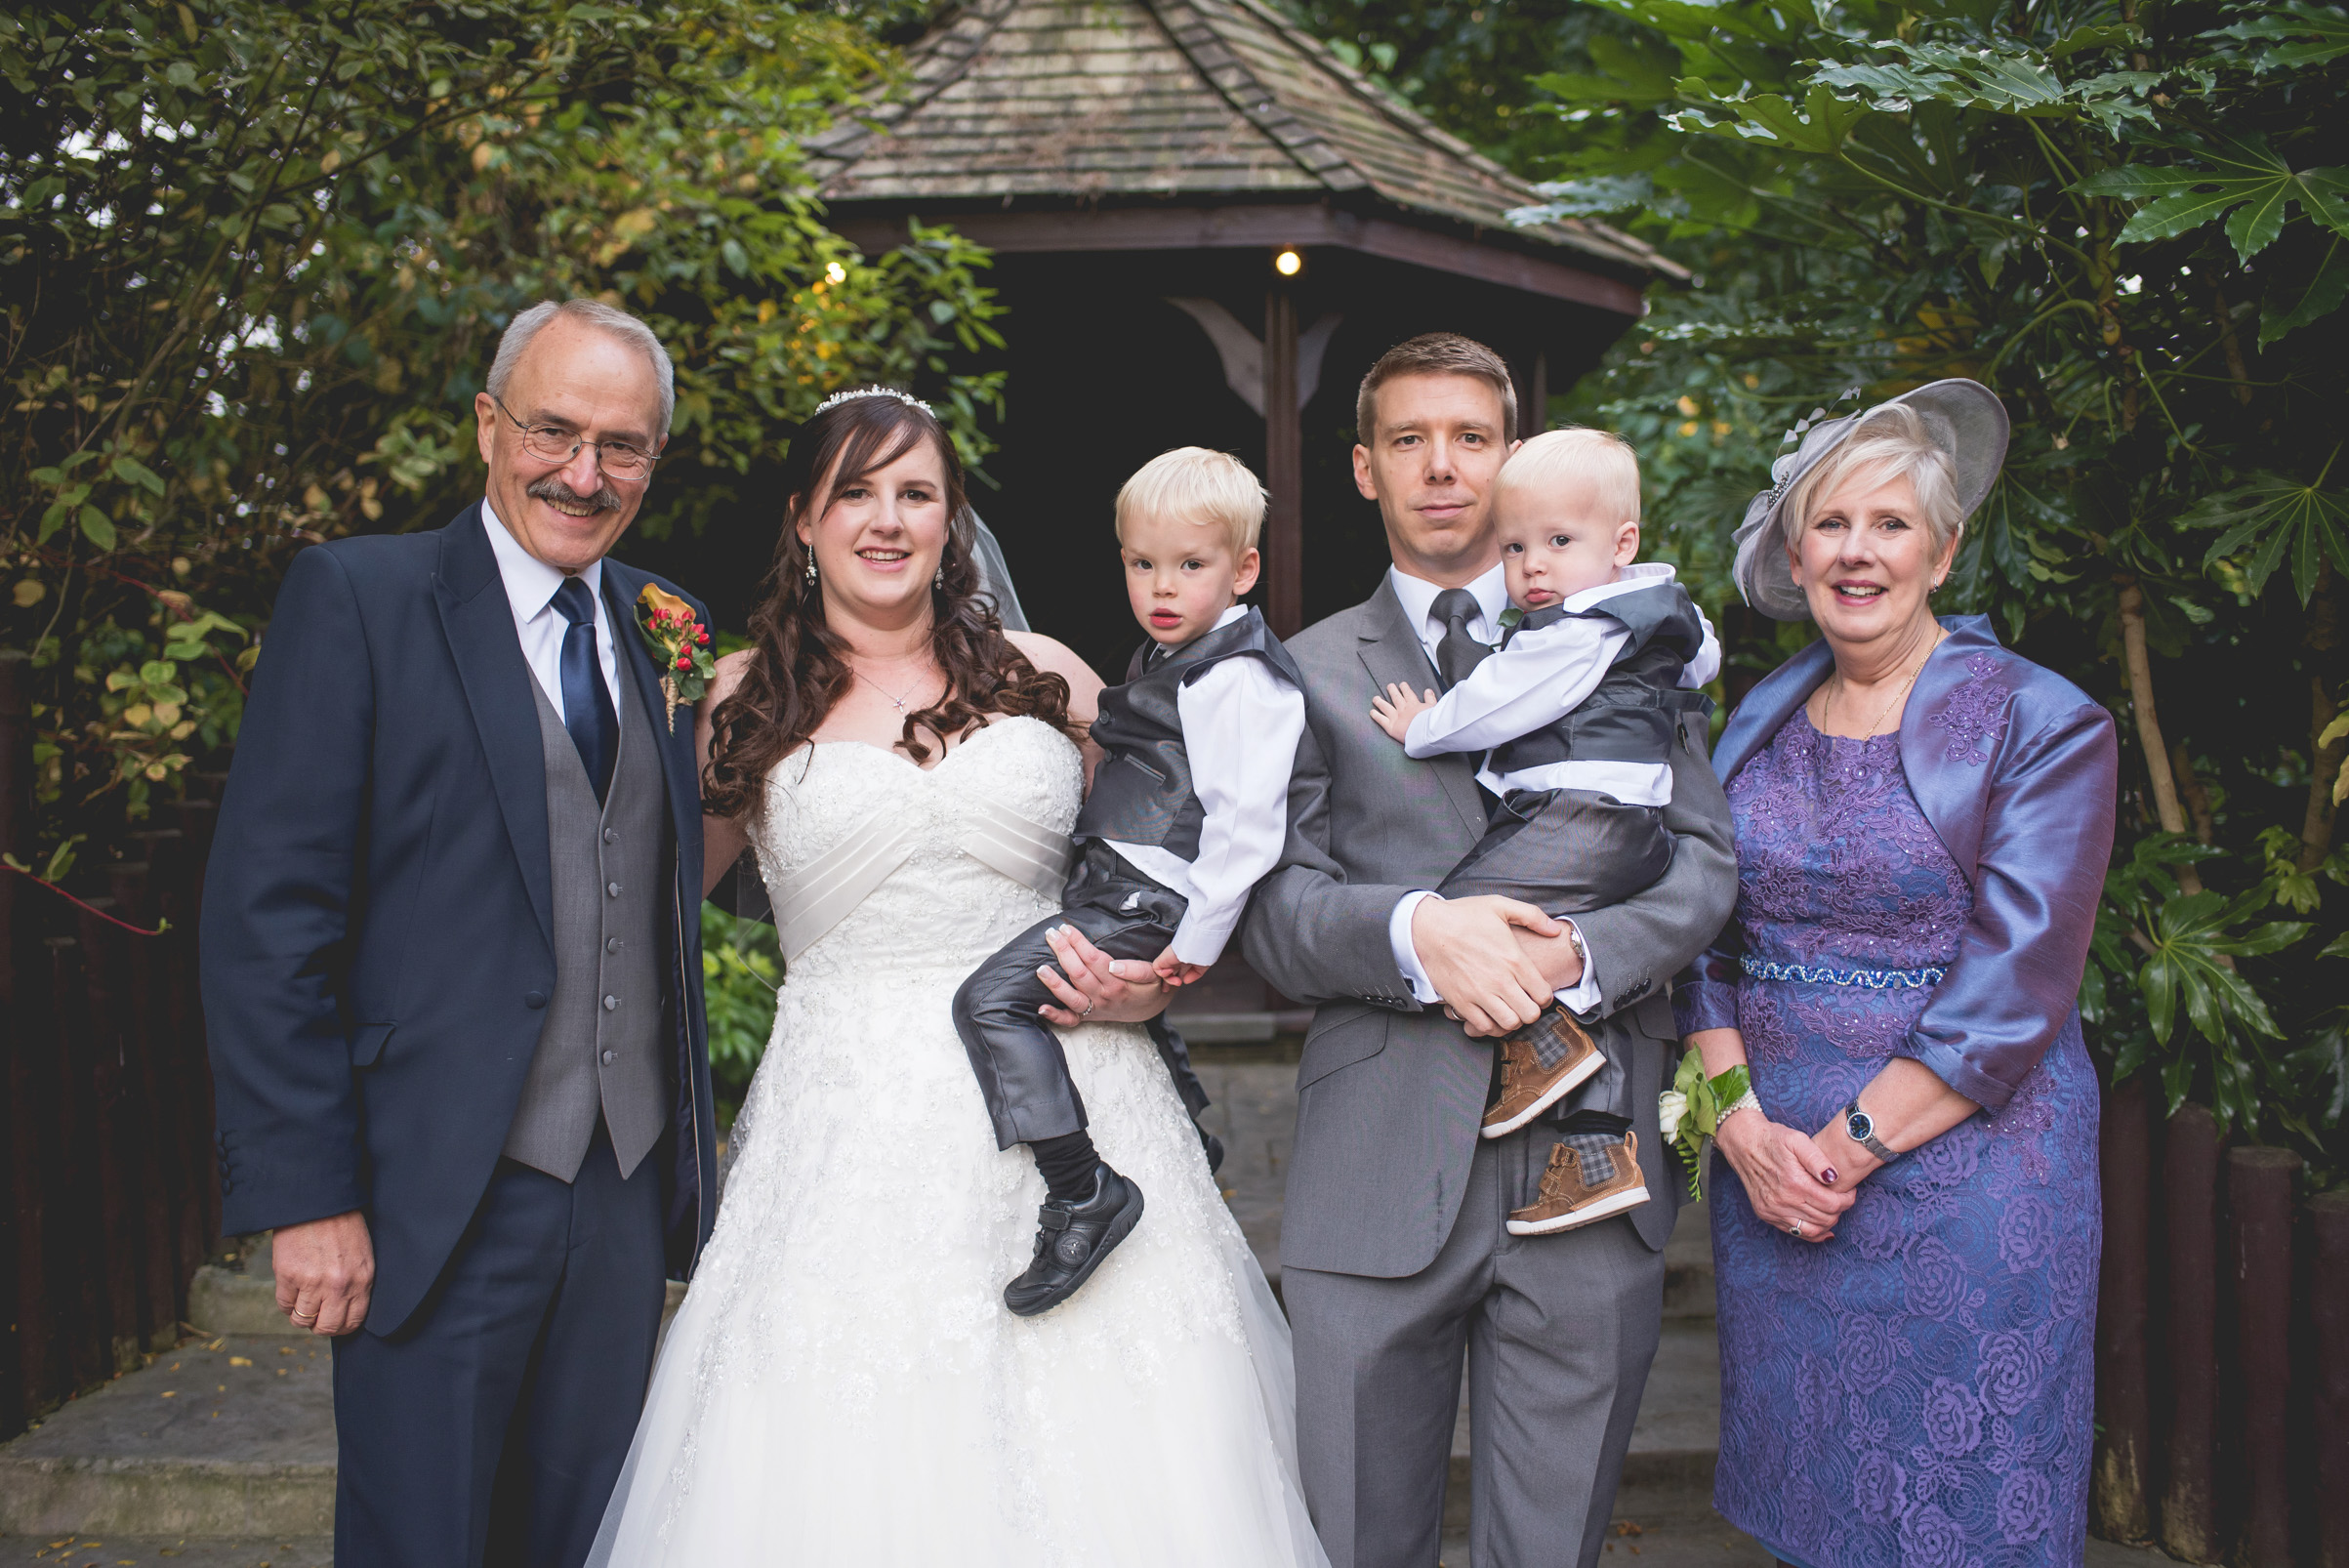 The+Fairlawns+wedding+Aldridge+StLukes+Church-149.jpg